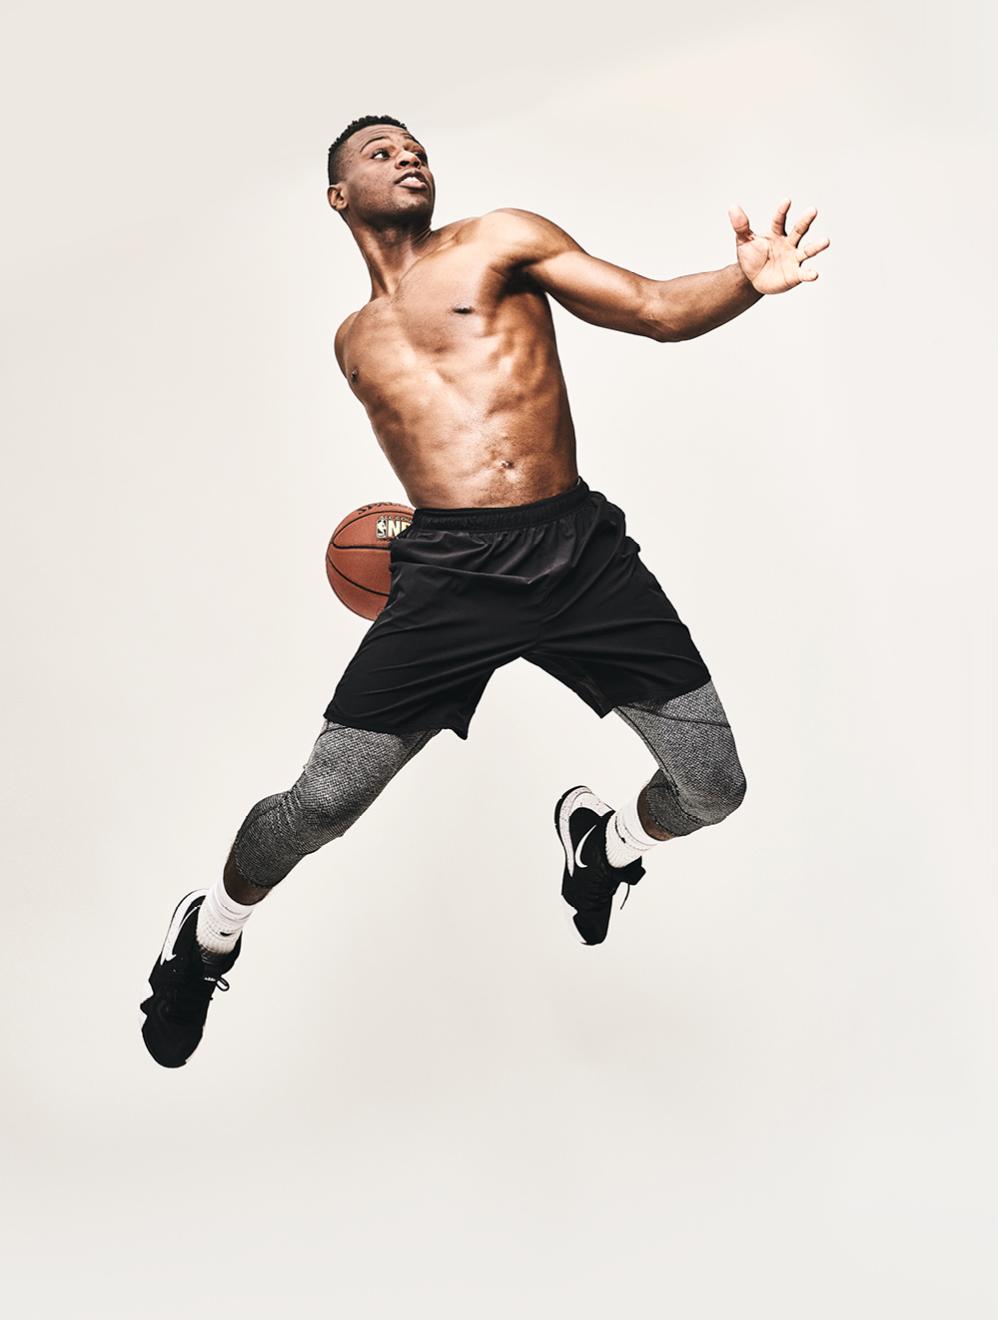 Everett_Aaron_Okayama_Basketball62.jpg